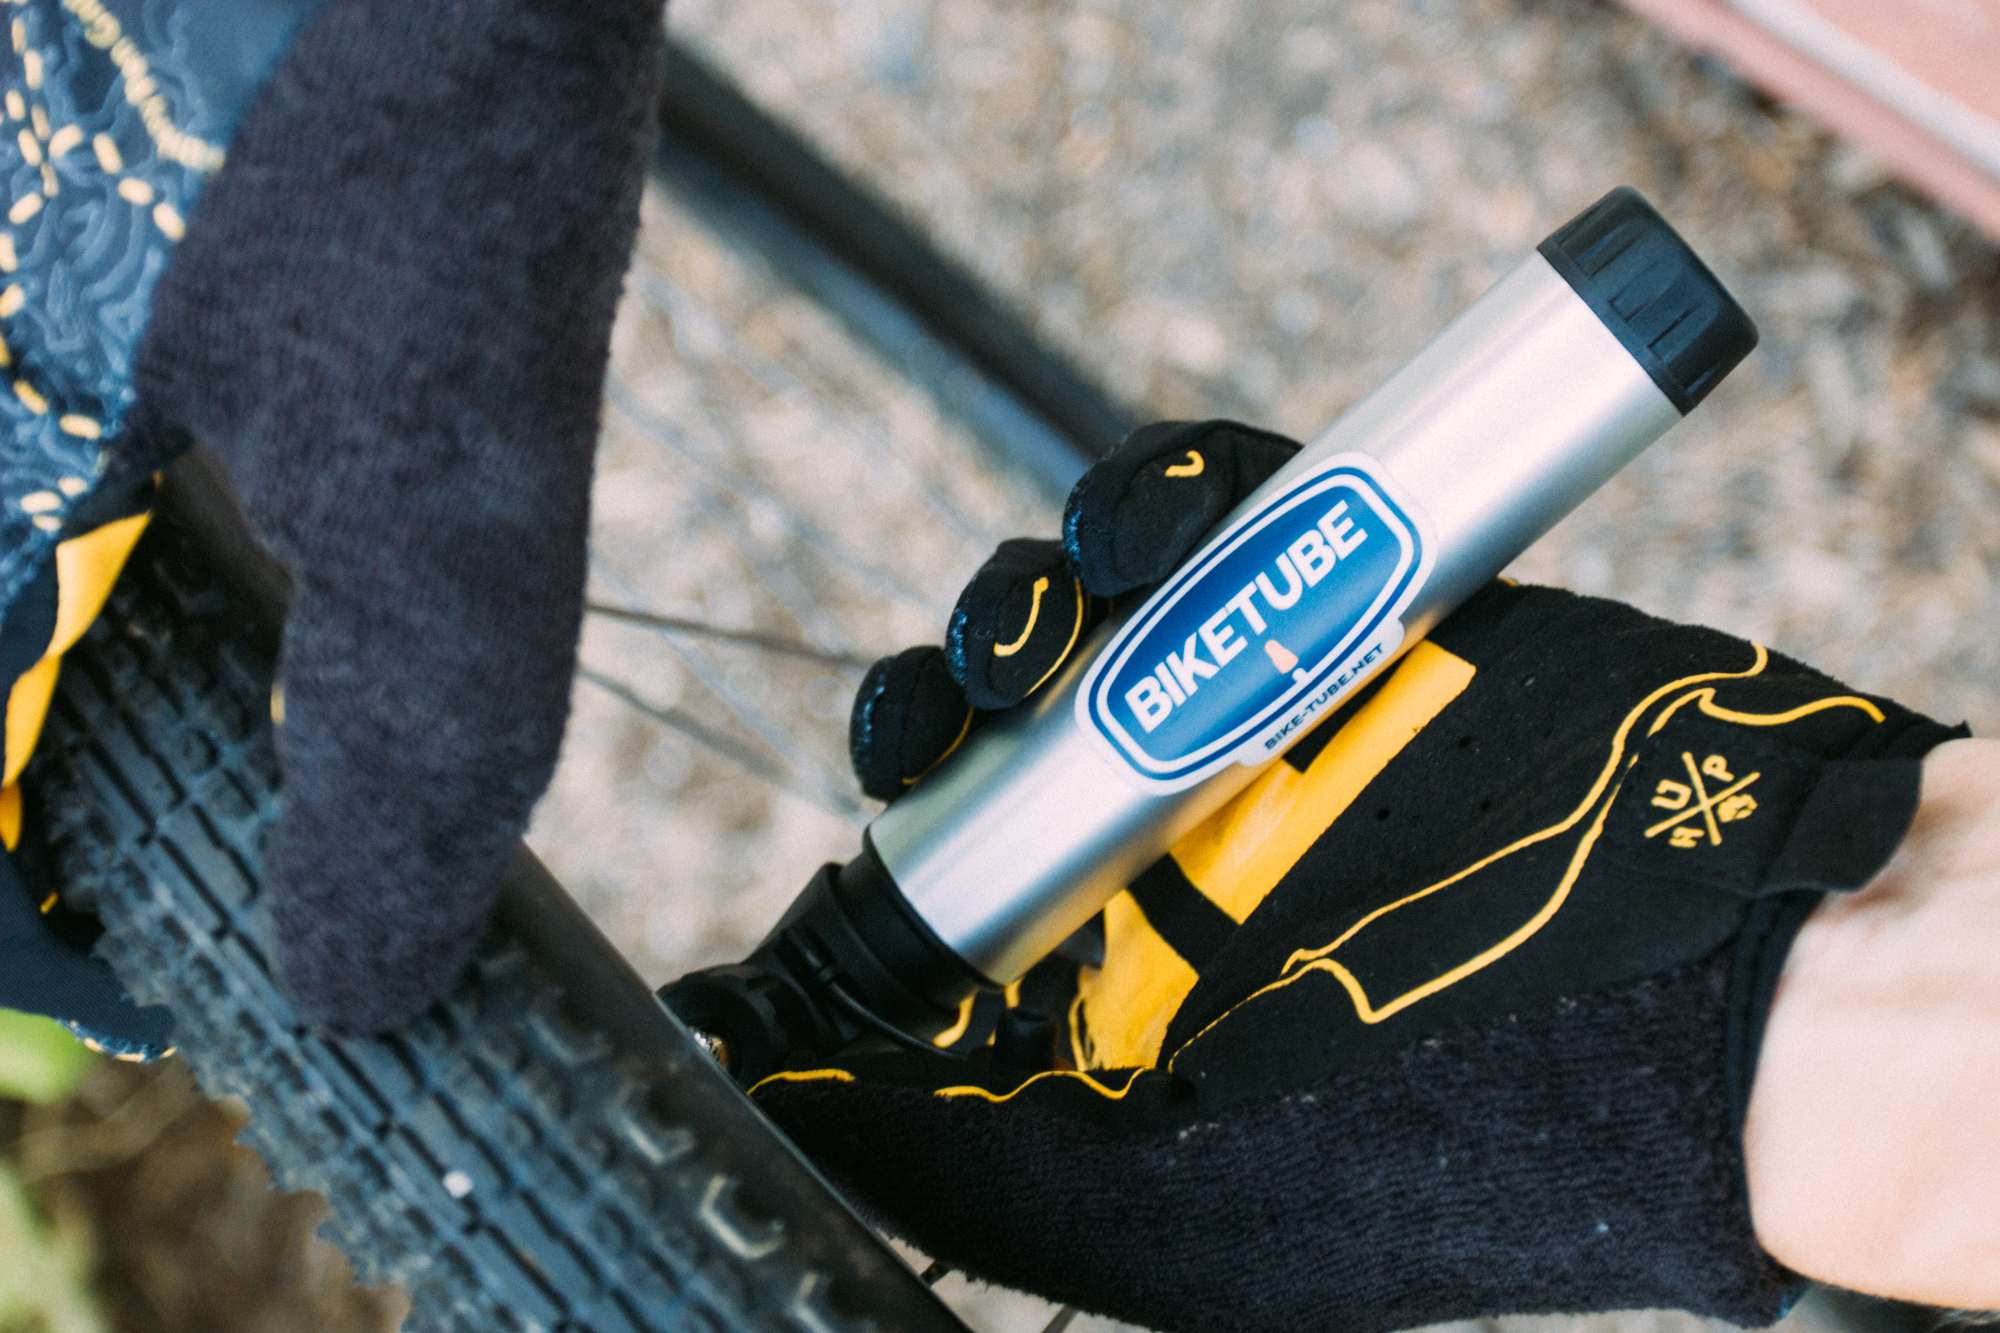 BIKETUBE Air Handler Mini Pump inflates gravel tires